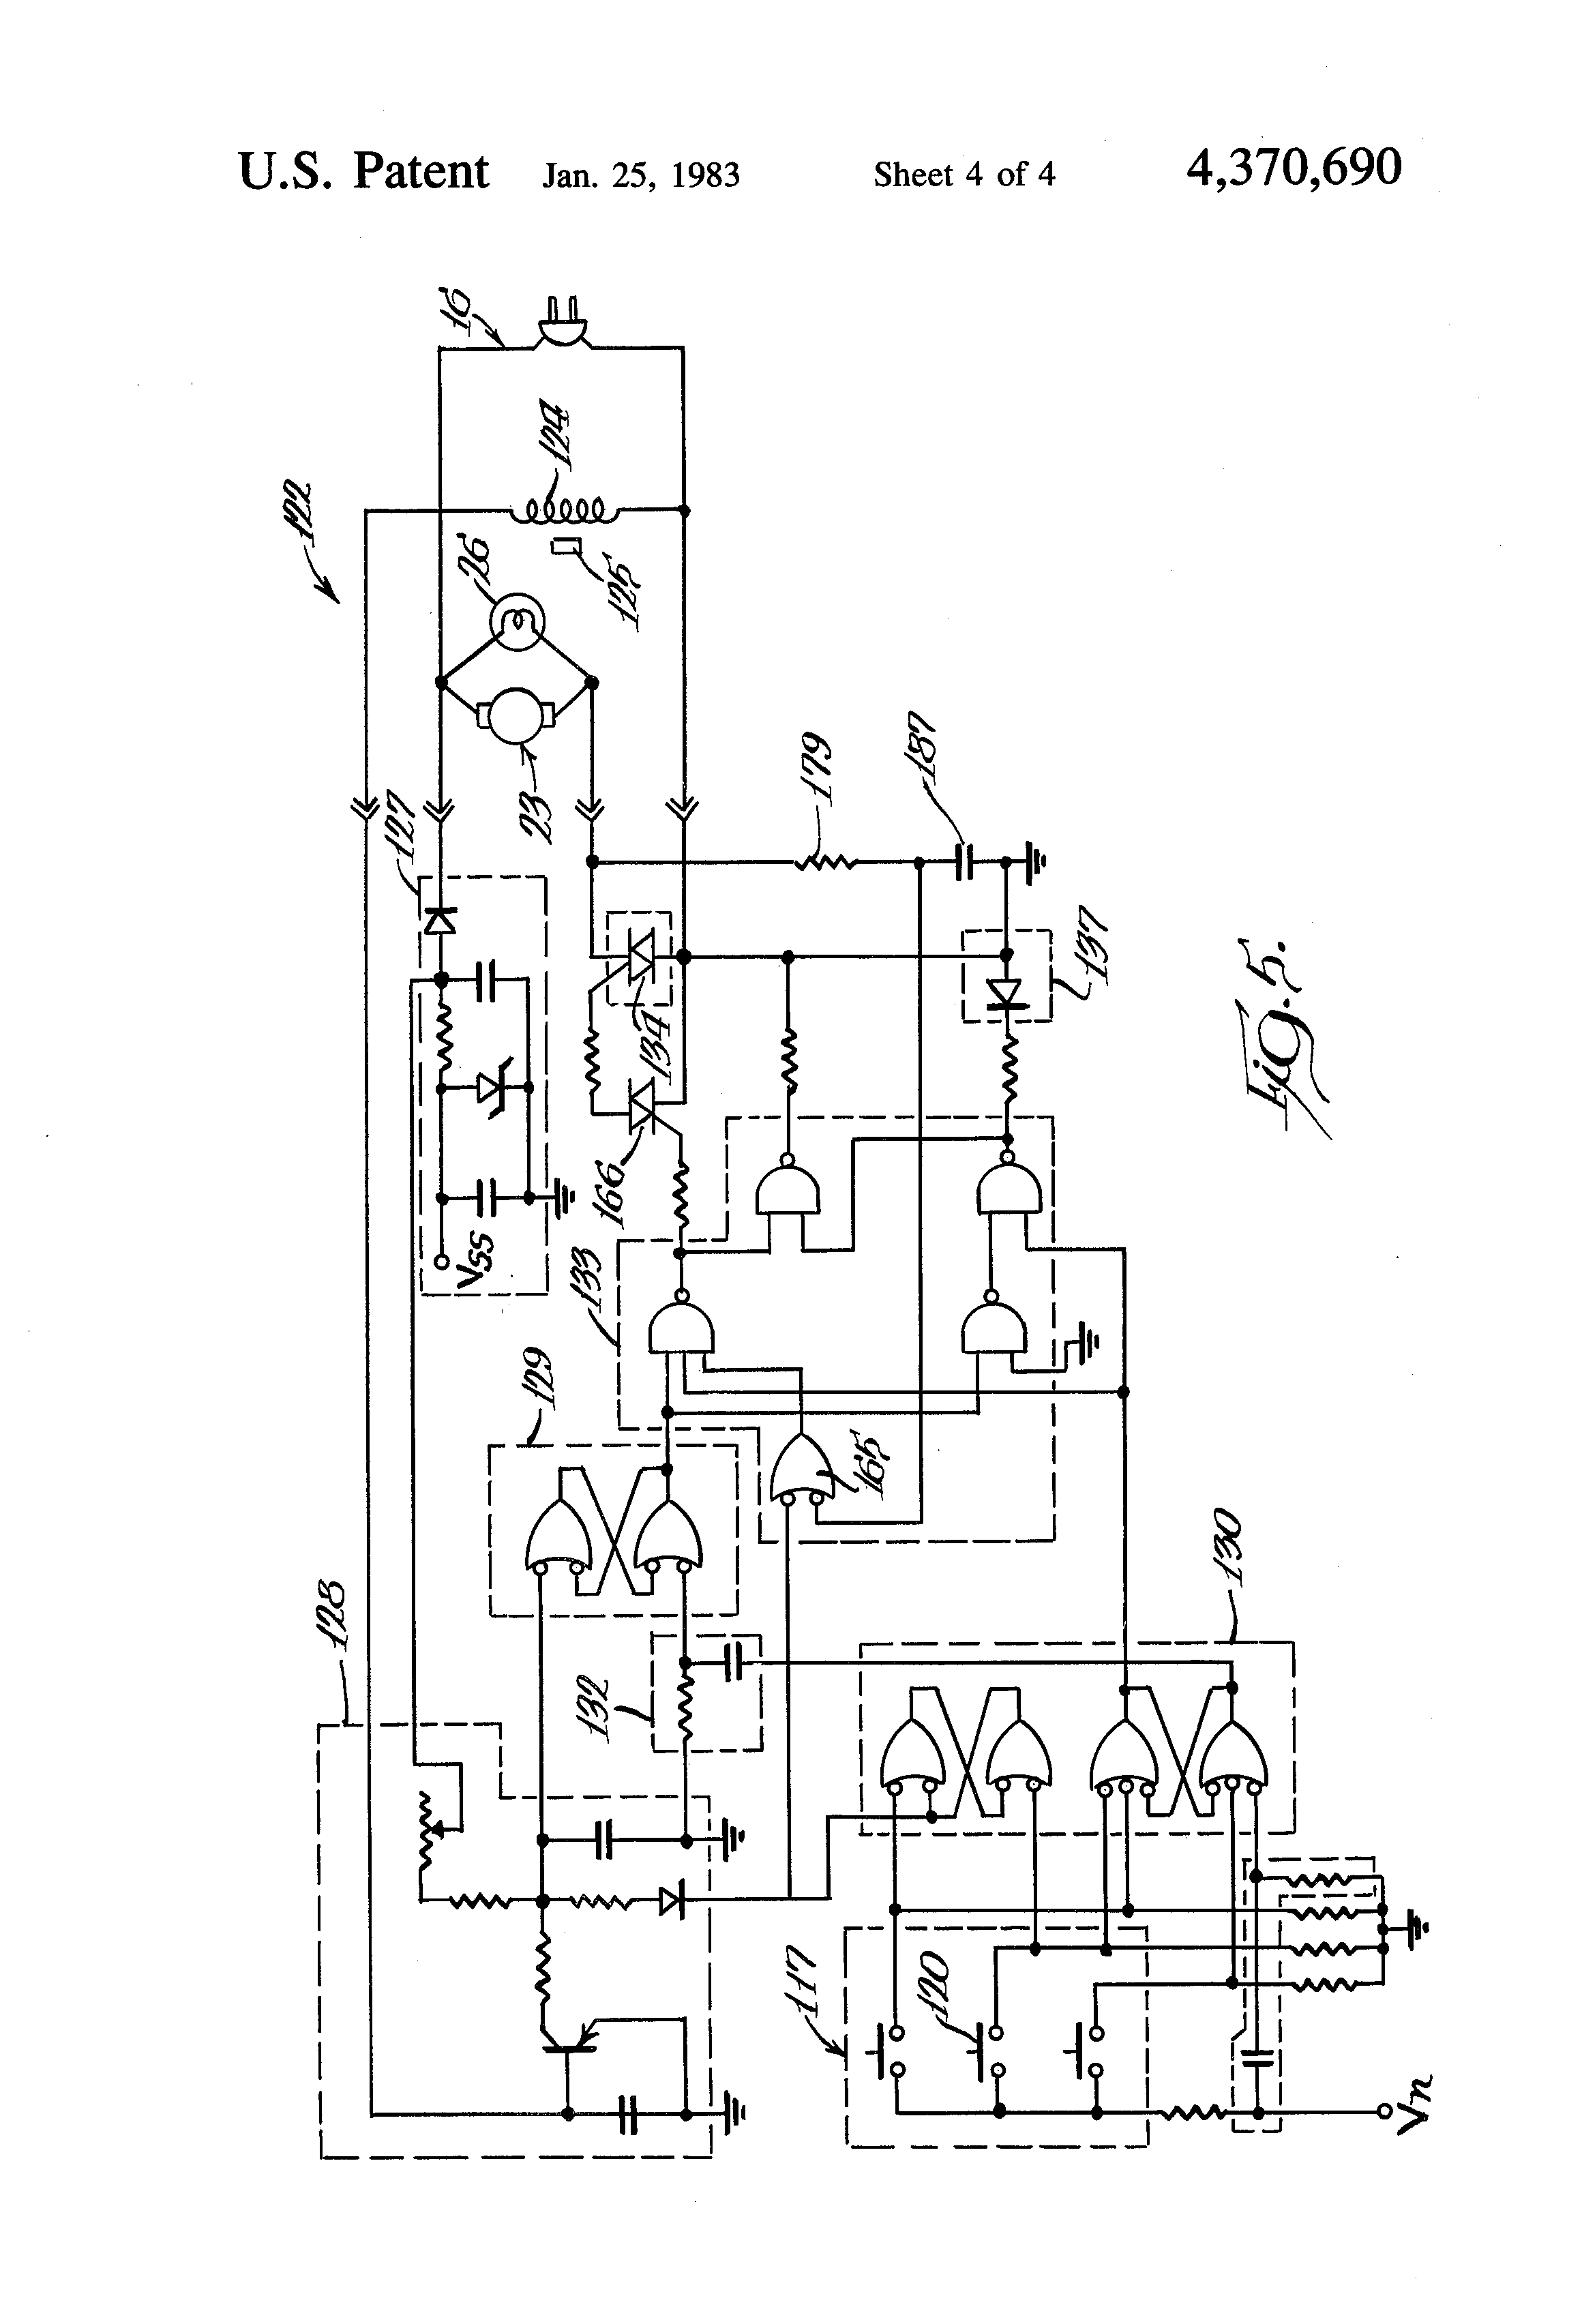 Patent US4370690 Vacuum cleaner control Google Patents – Royal Vacuum Cleaner Wiring Diagram